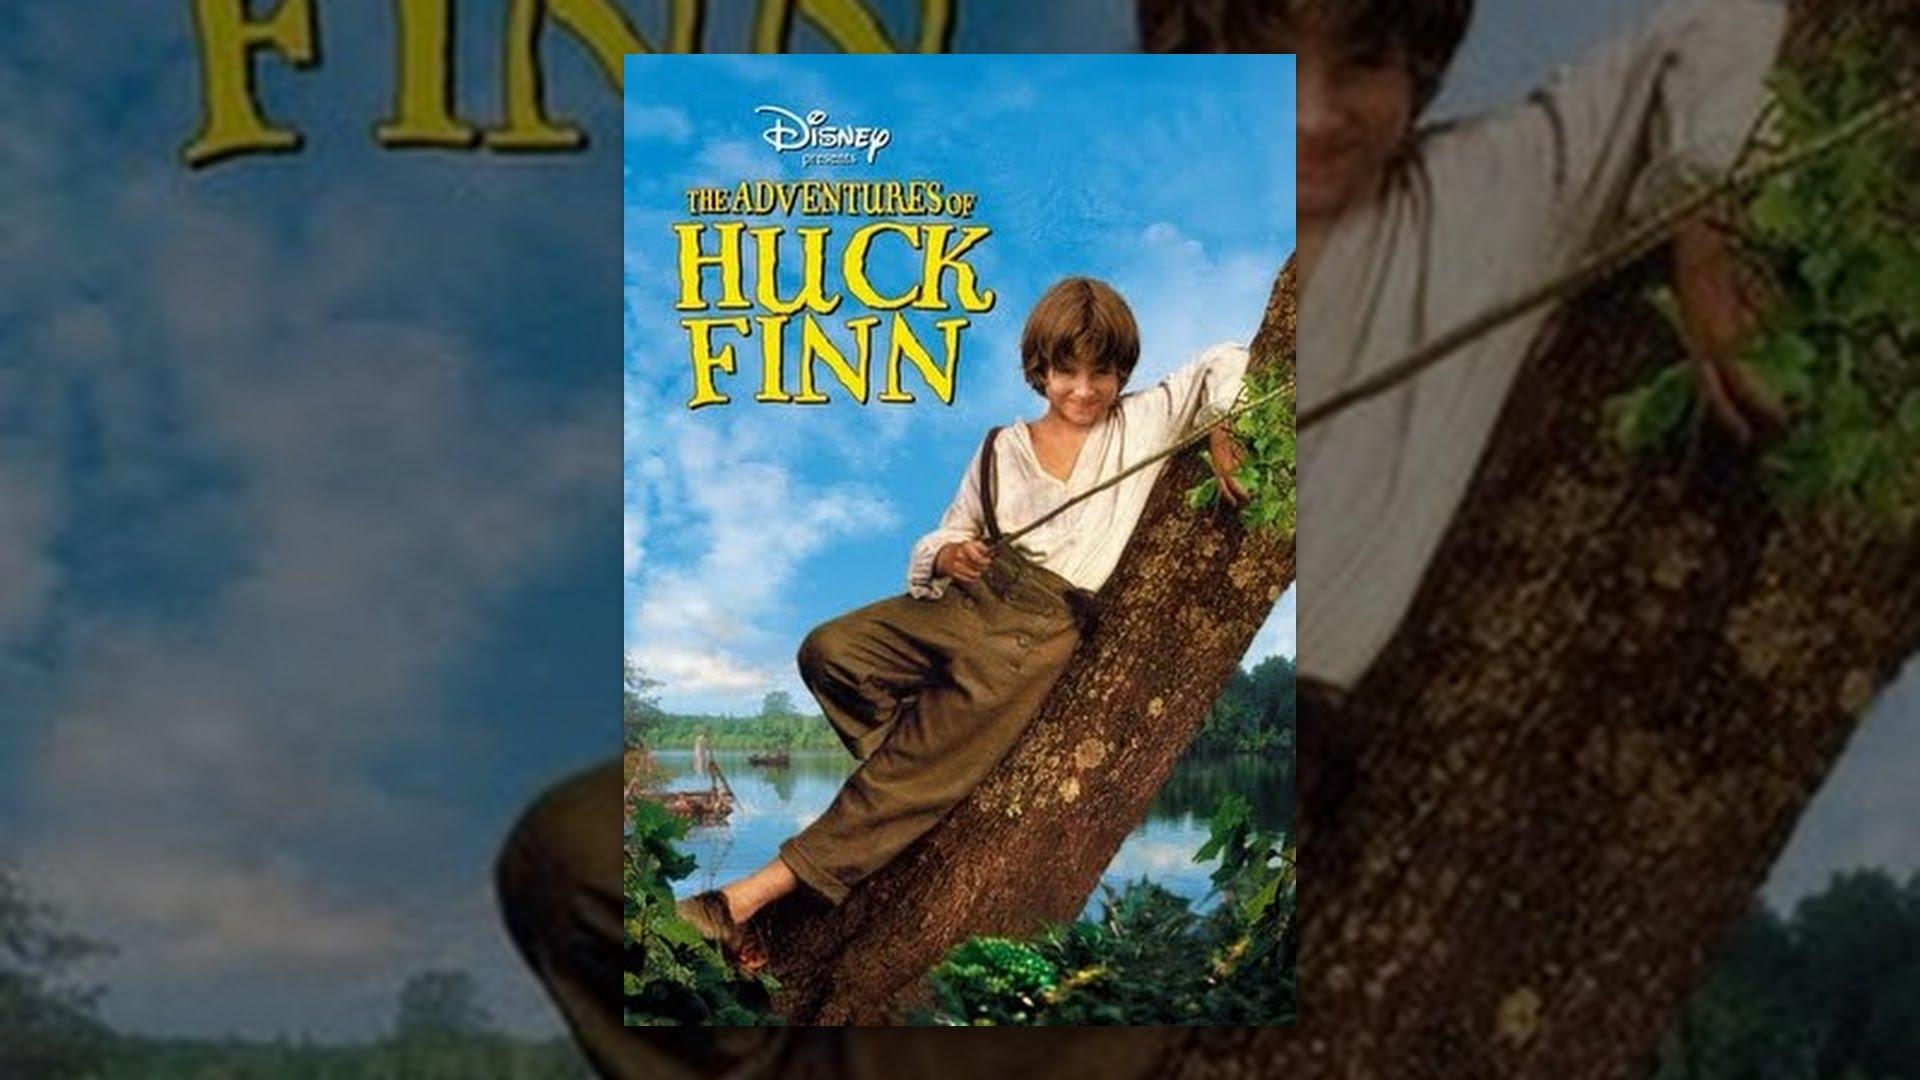 The Adventures of Huck Finn - YouTube